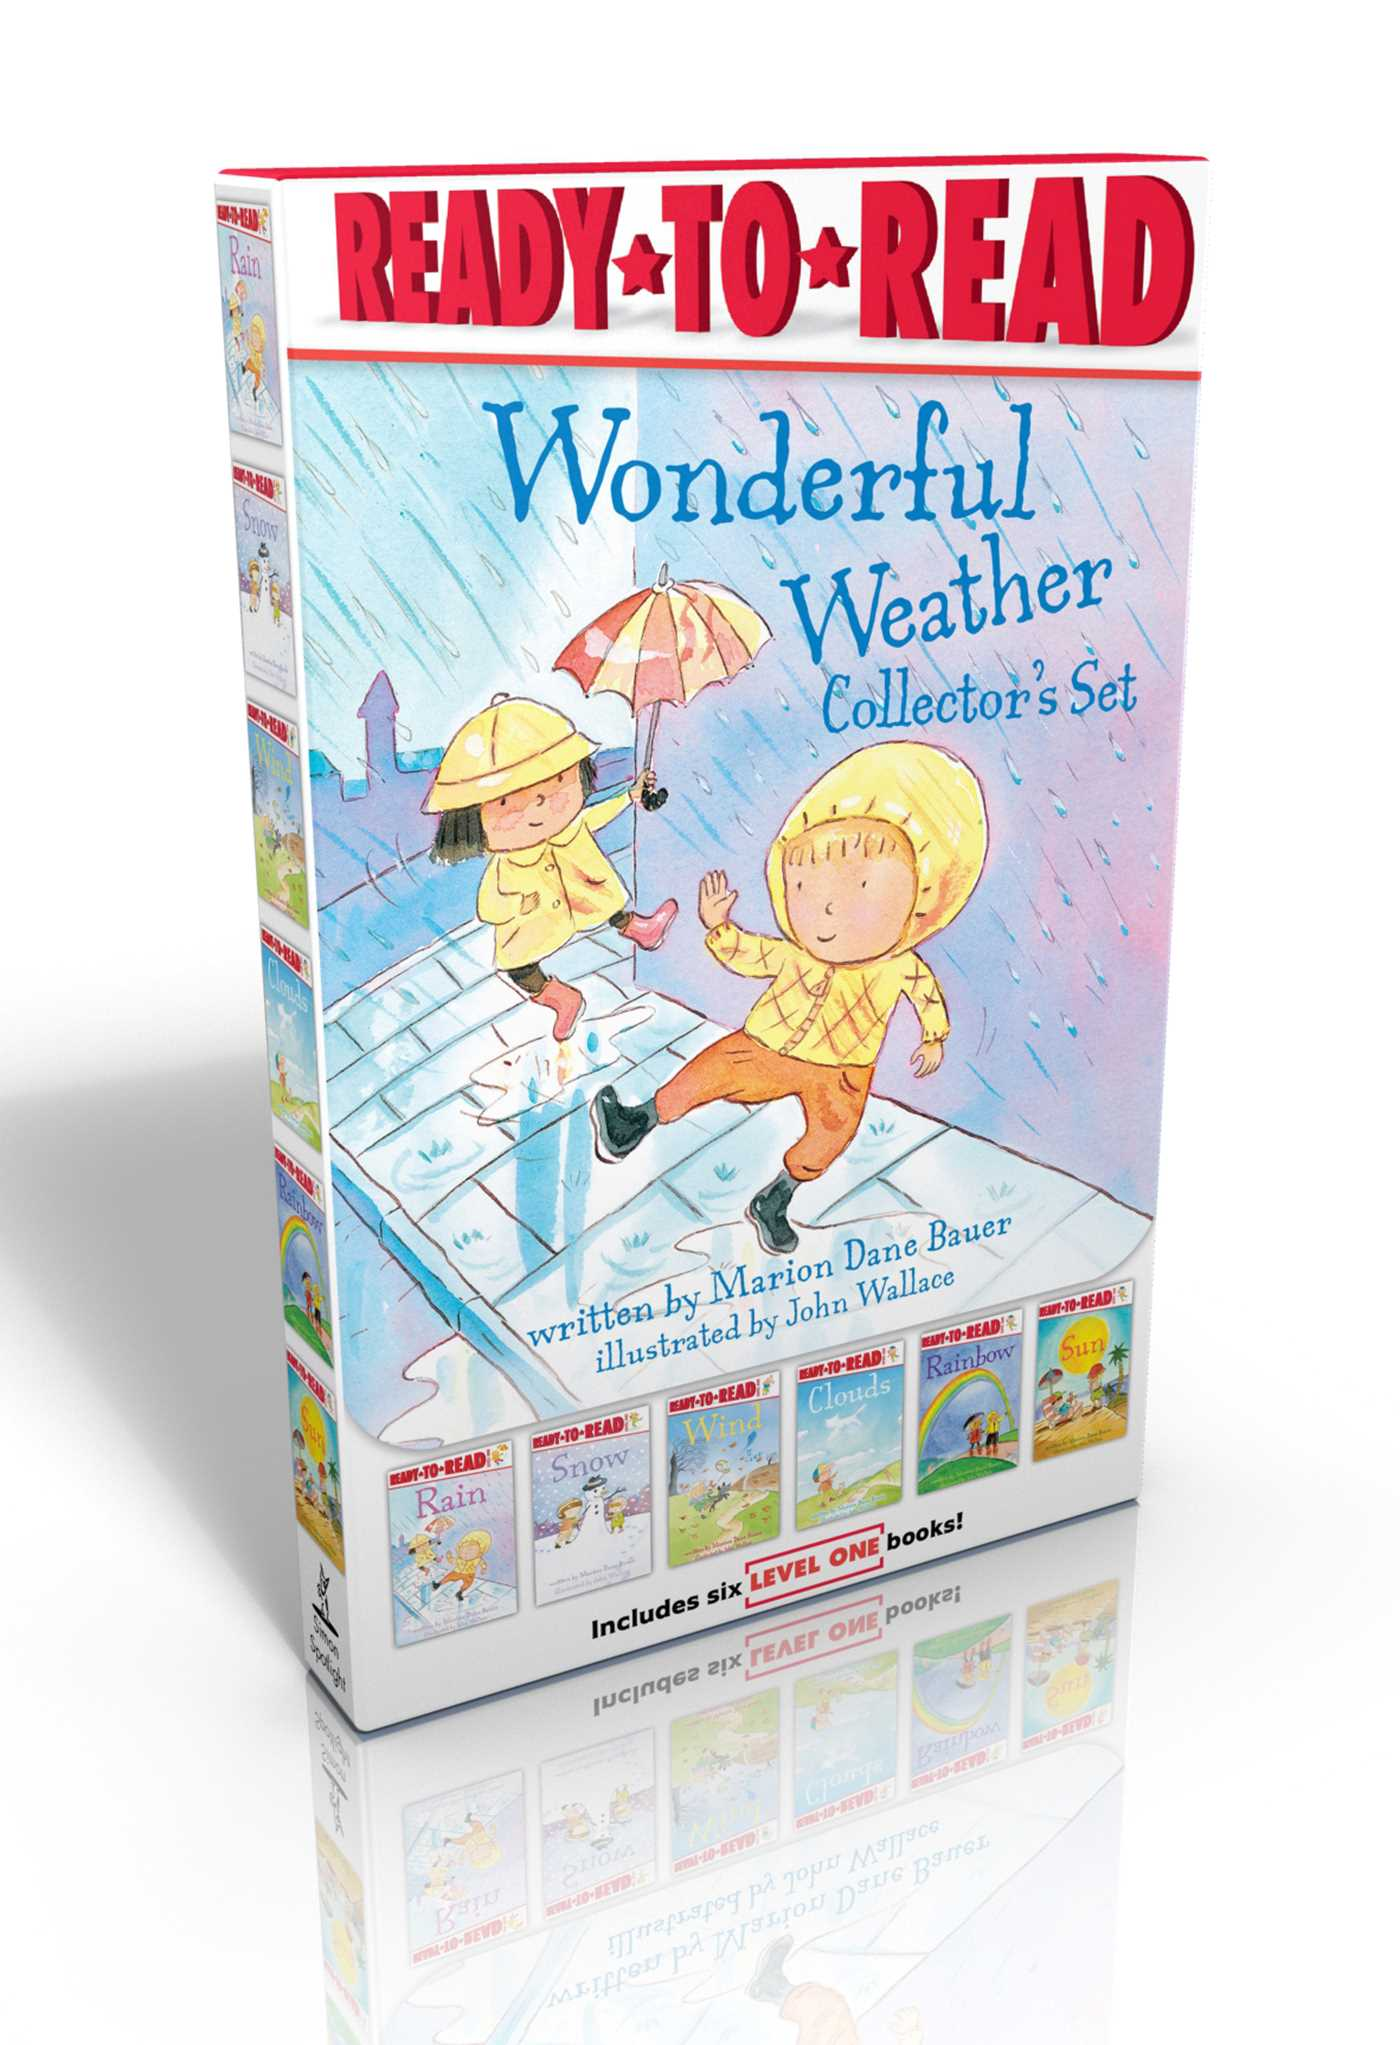 The wonderful weather collectors set 9781481466943 hr